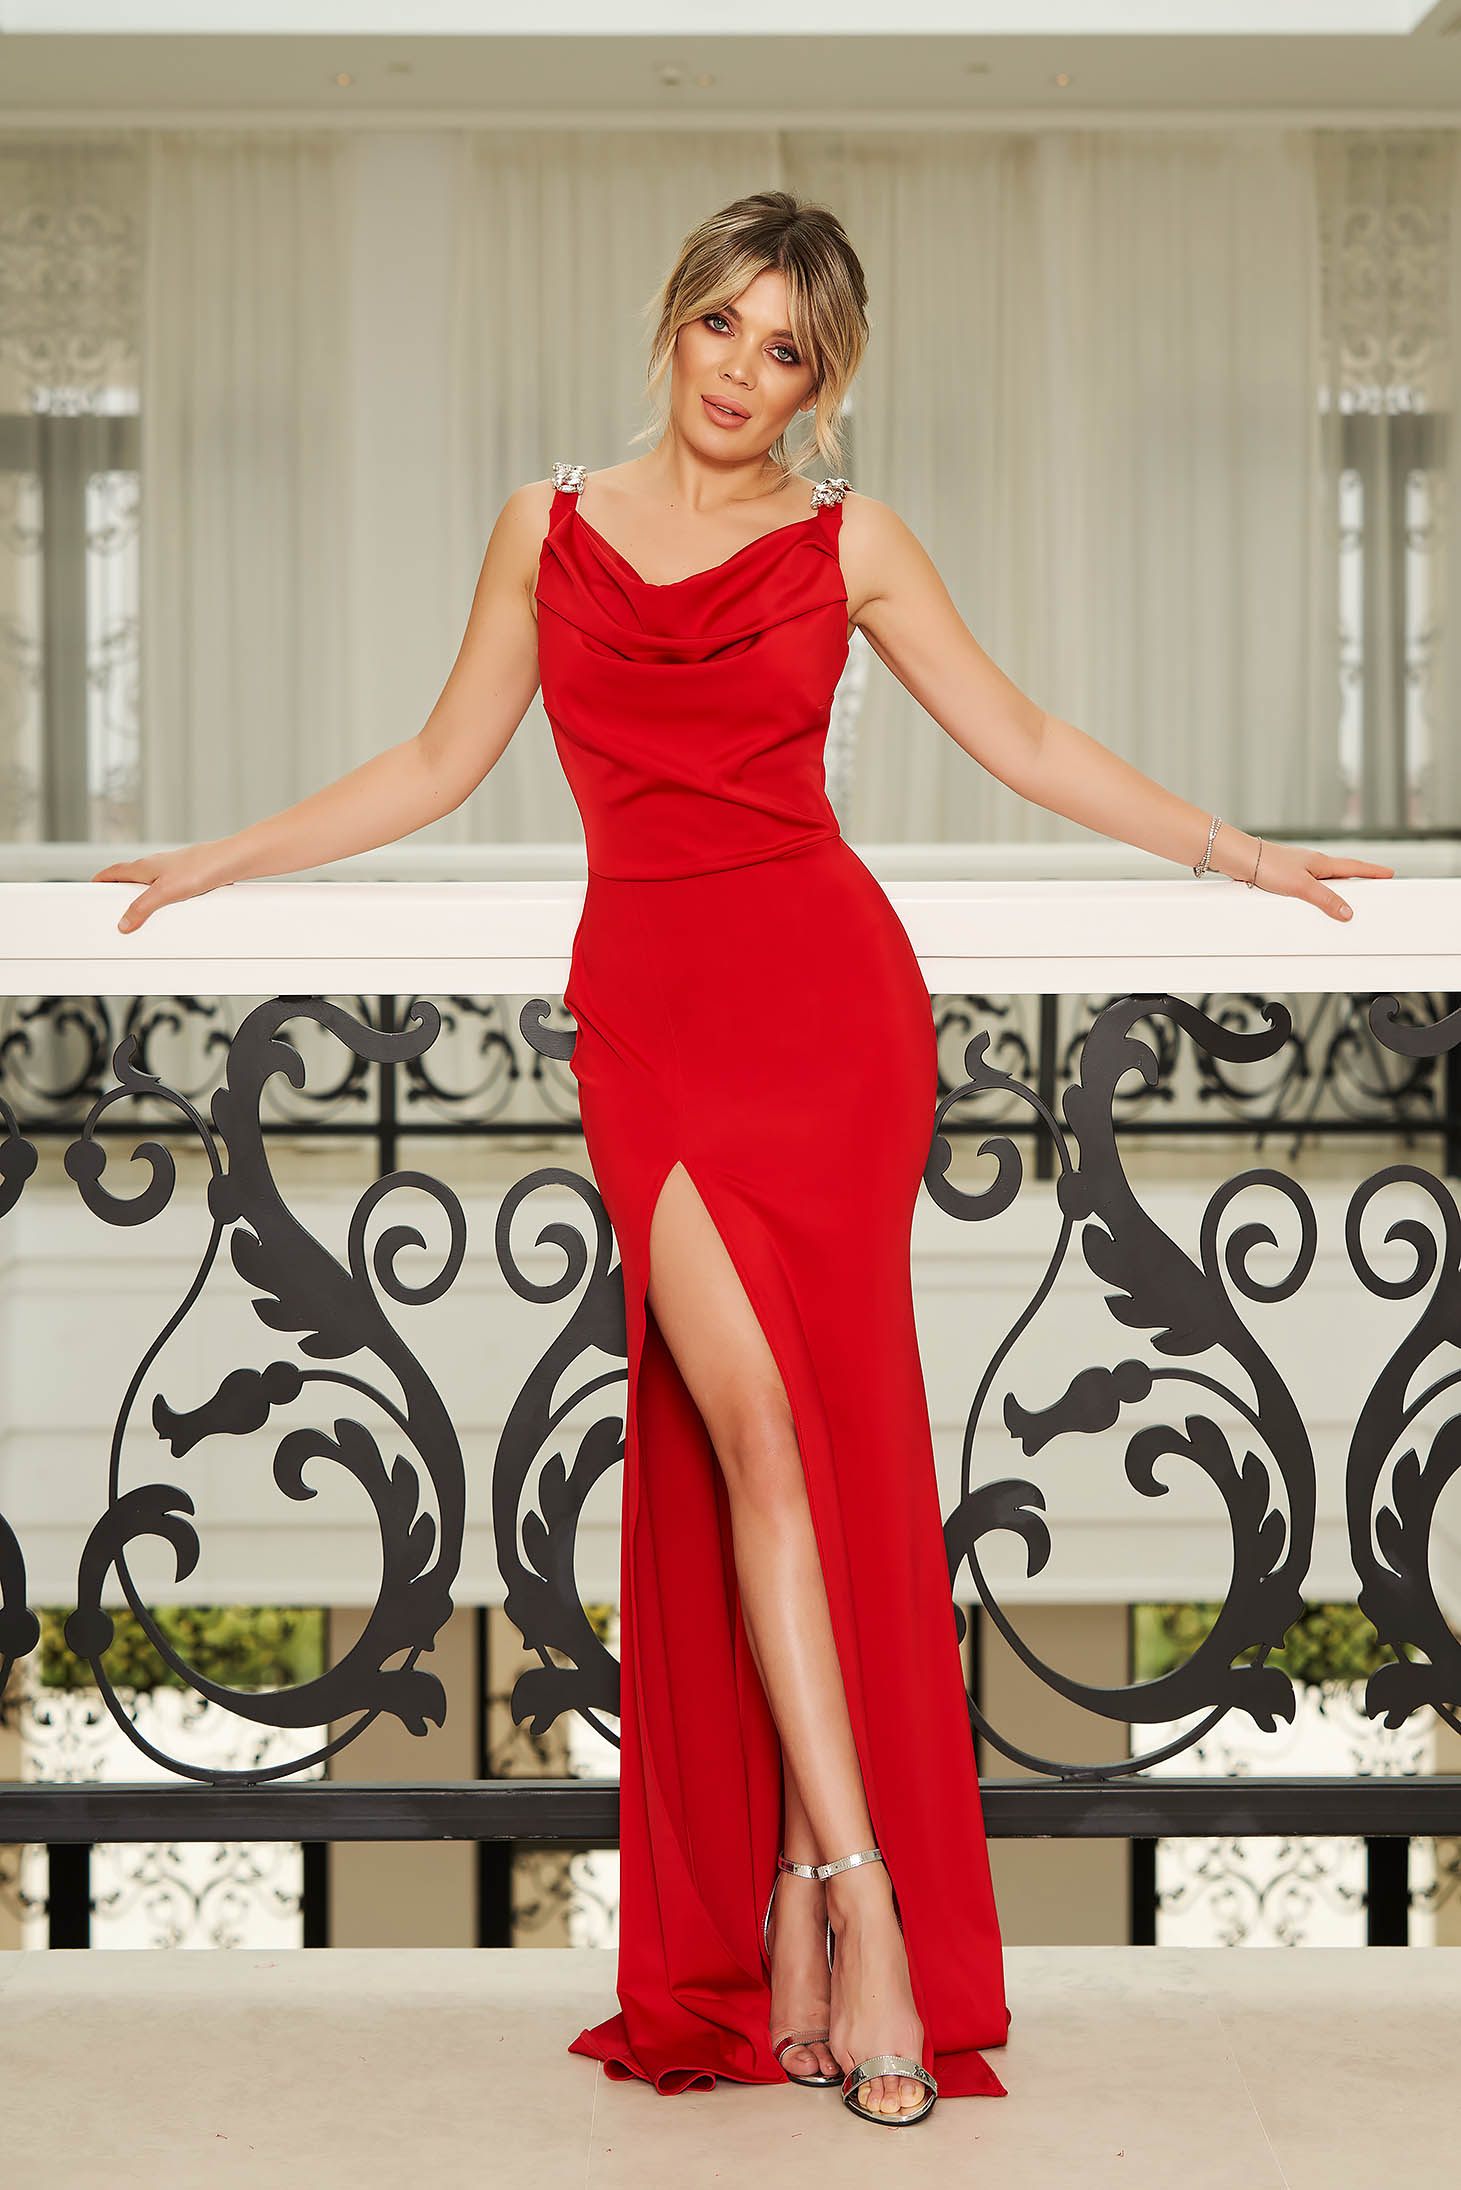 Rochie StarShinerS rosie de ocazie lunga tip sirena fara maneci accesorizata cu pietre stras